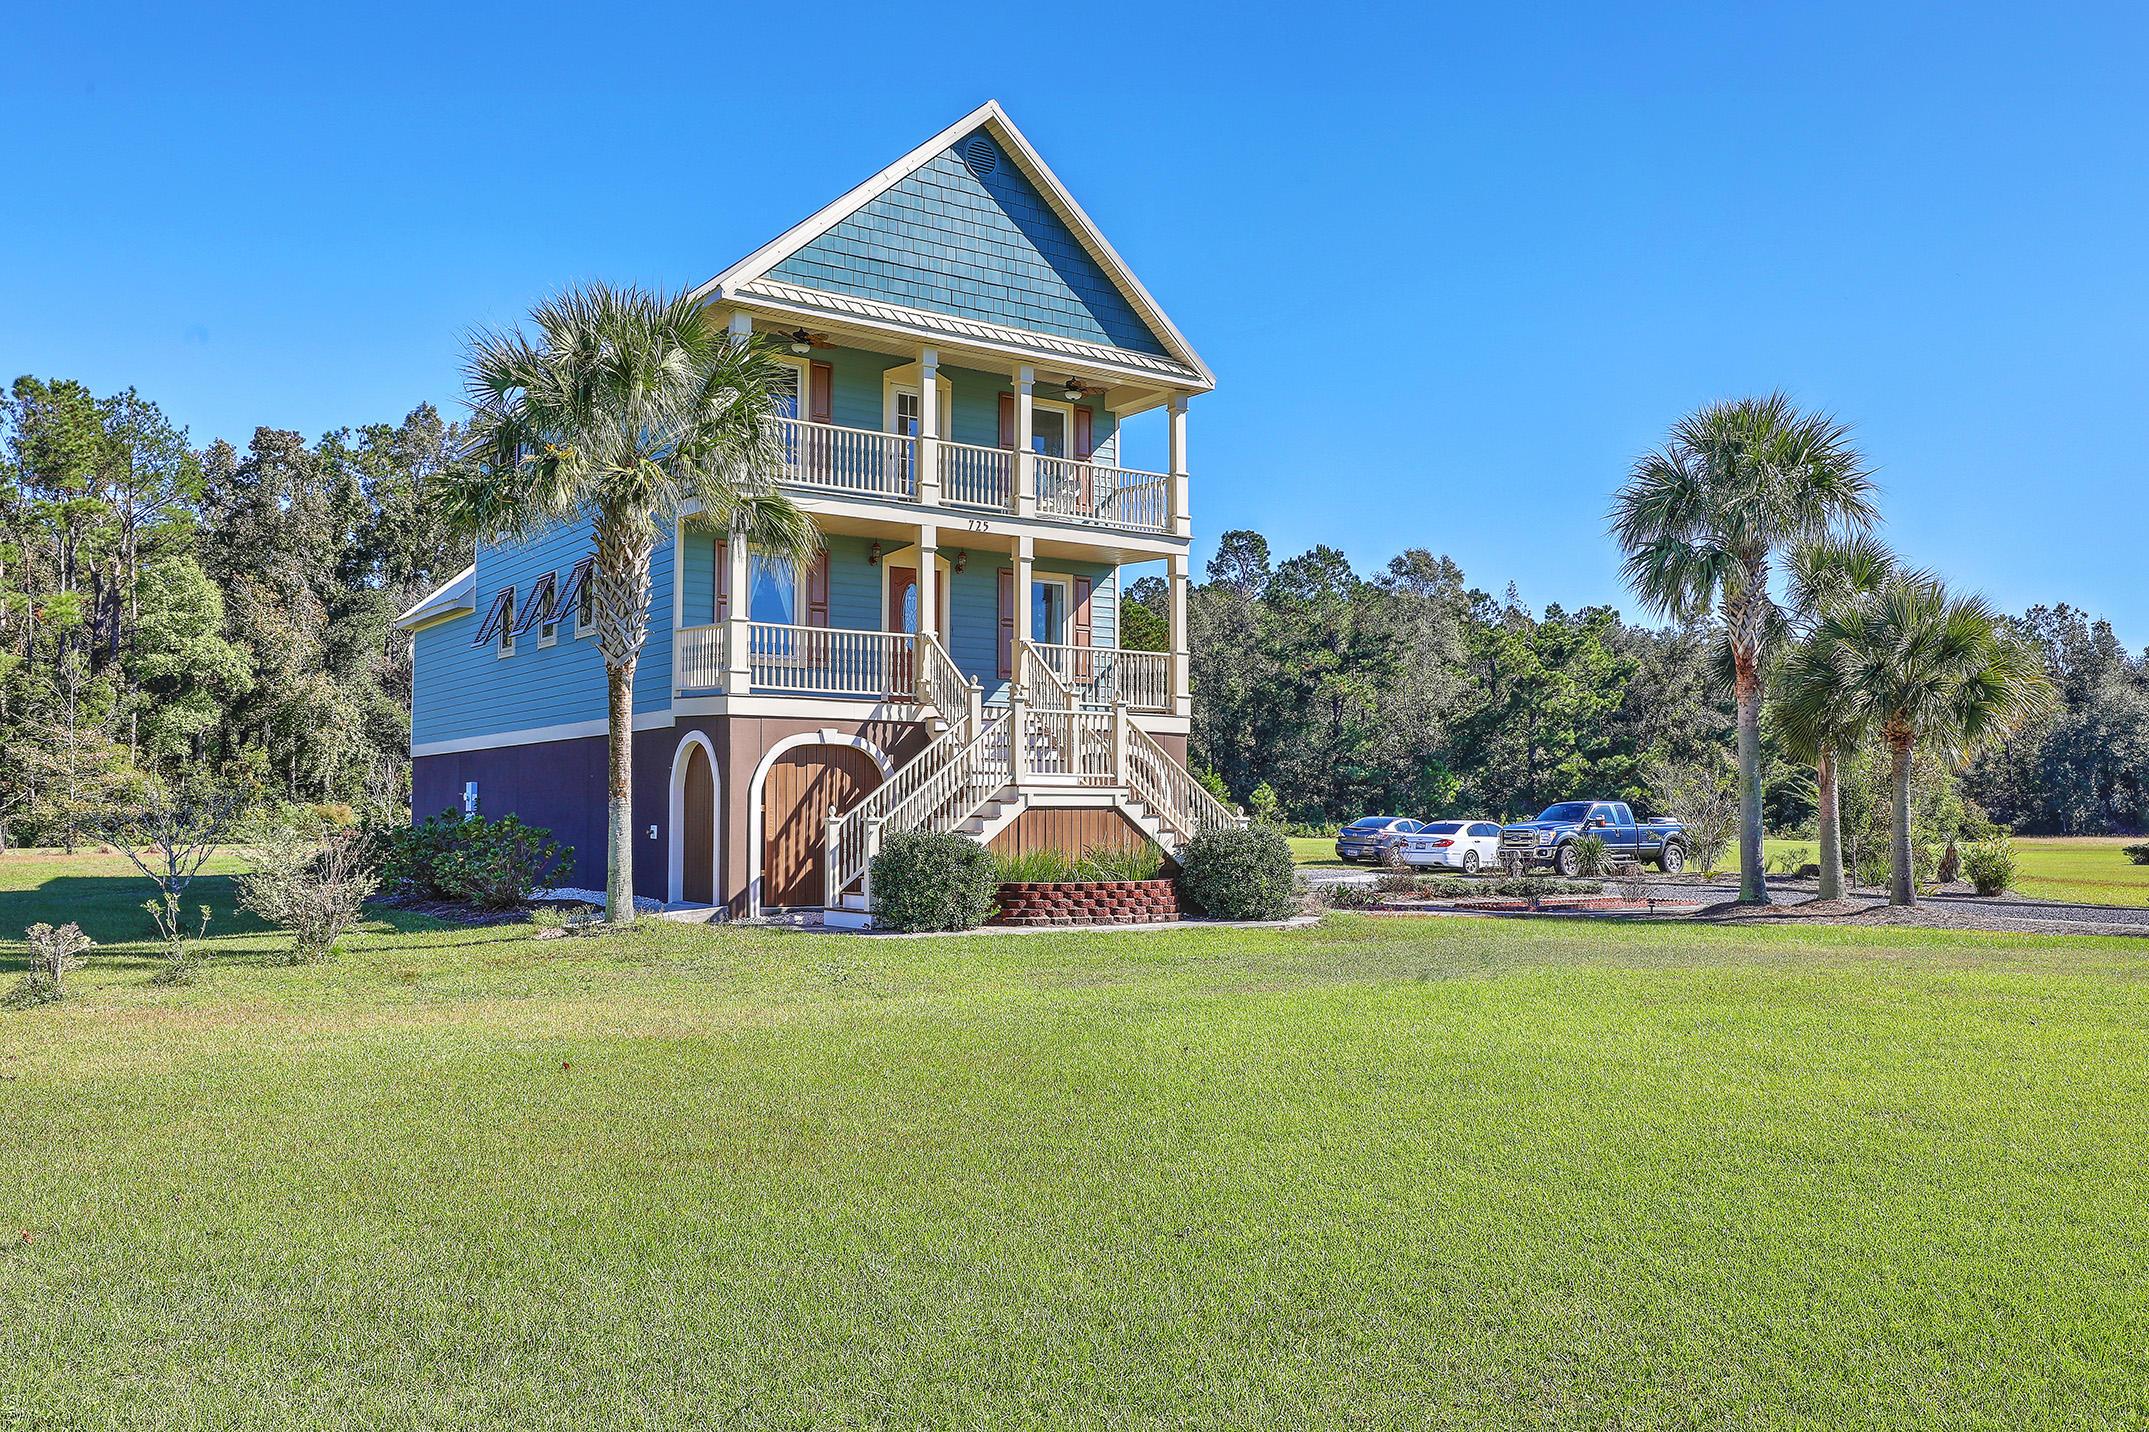 Marshall Creek Homes For Sale - 725 Sonny Boy, Johns Island, SC - 2